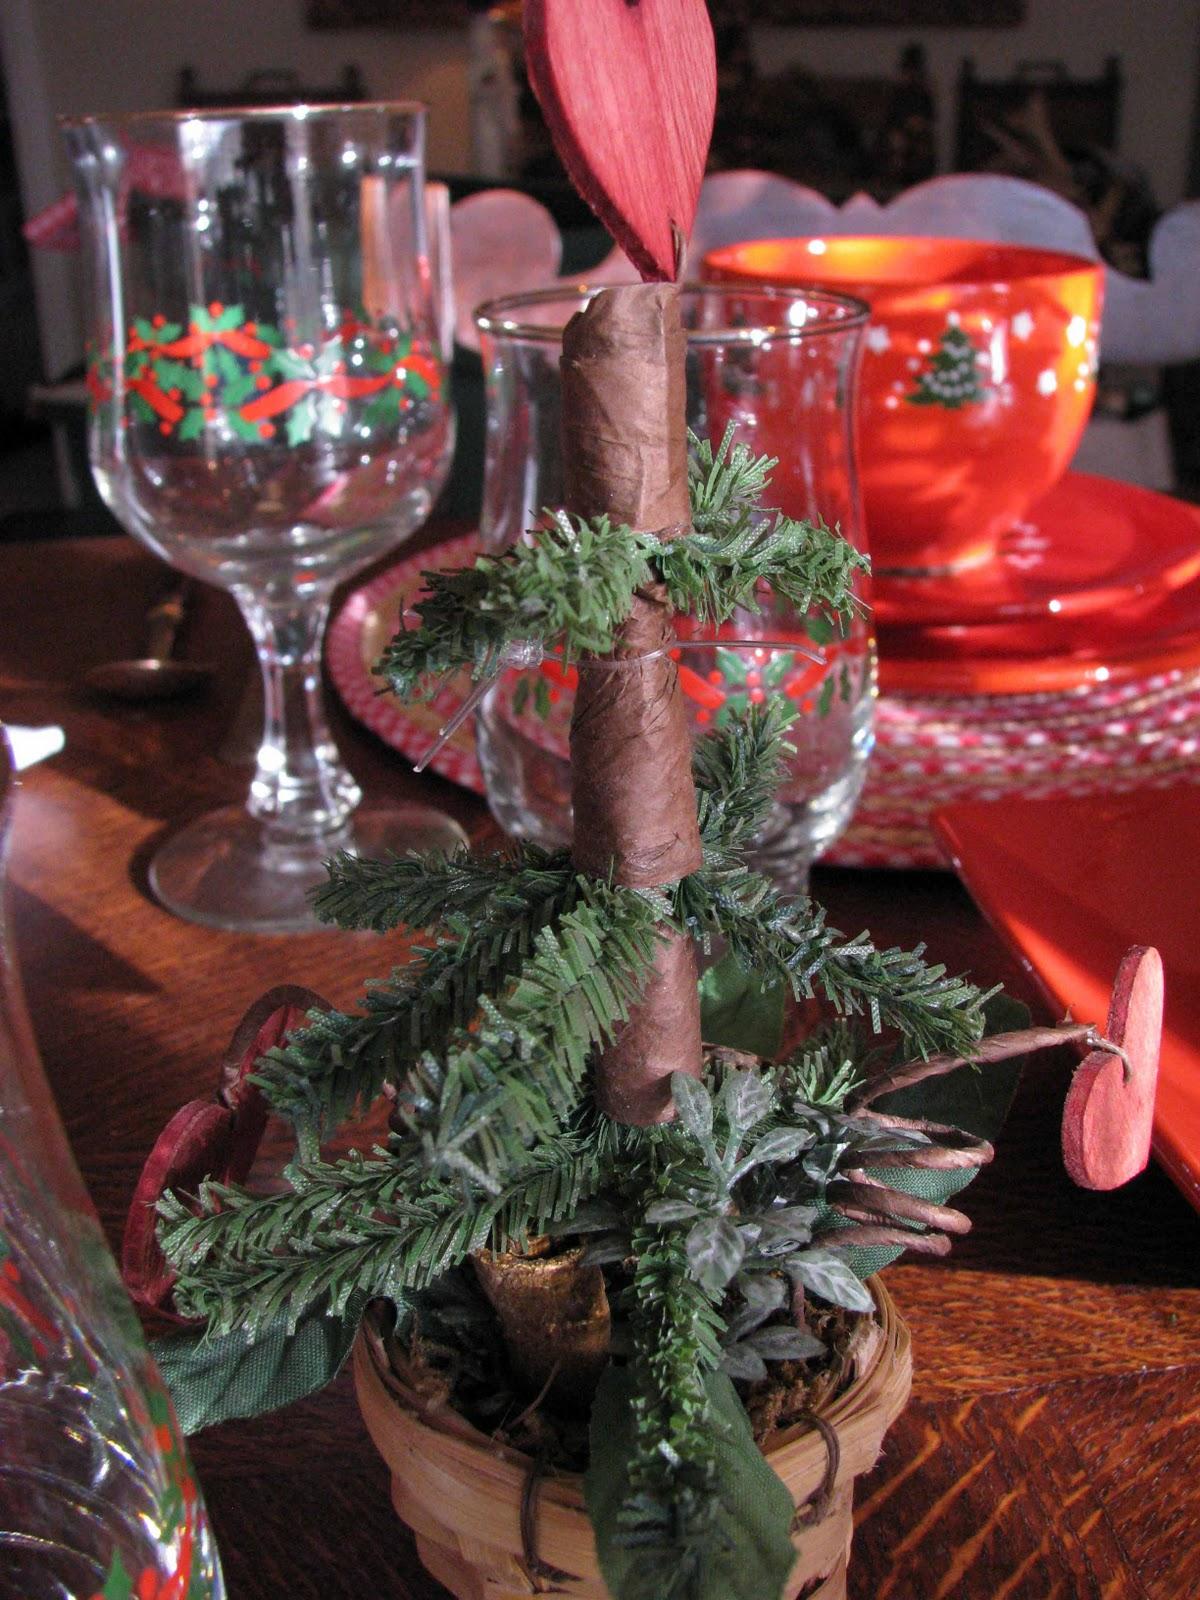 The Three Trees Christmas Story